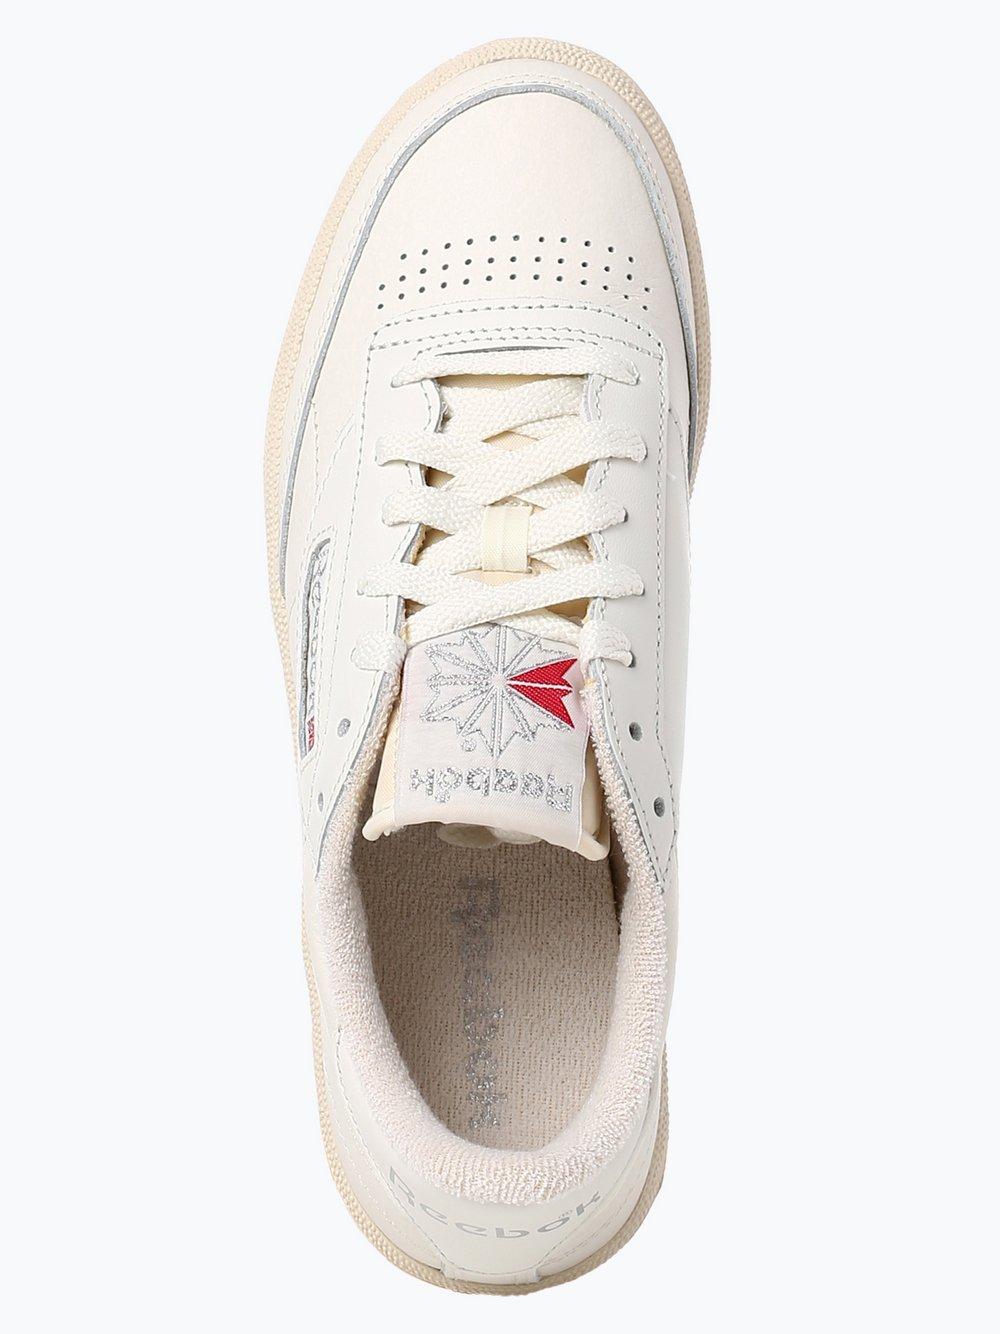 Reebok Damen Sneaker aus Leder Club C 85 Vintage online